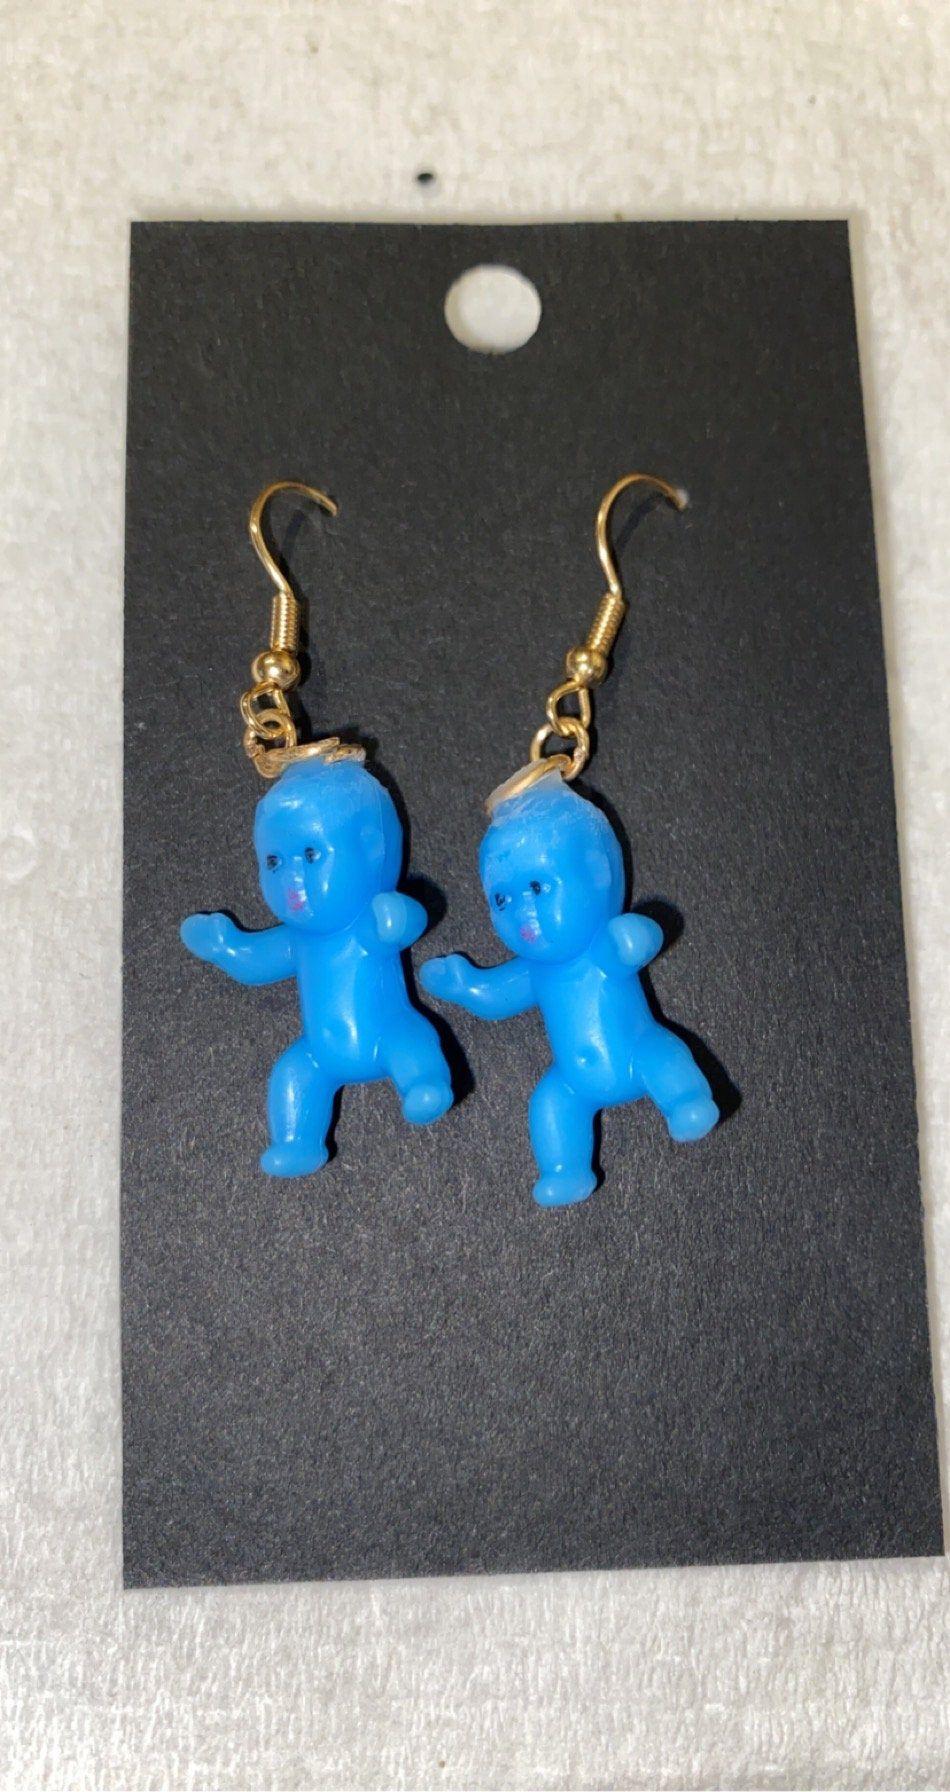 Plastic Baby Doll Earrings Etsy In 2020 Etsy Earrings Crazy Earrings Homemade Earrings